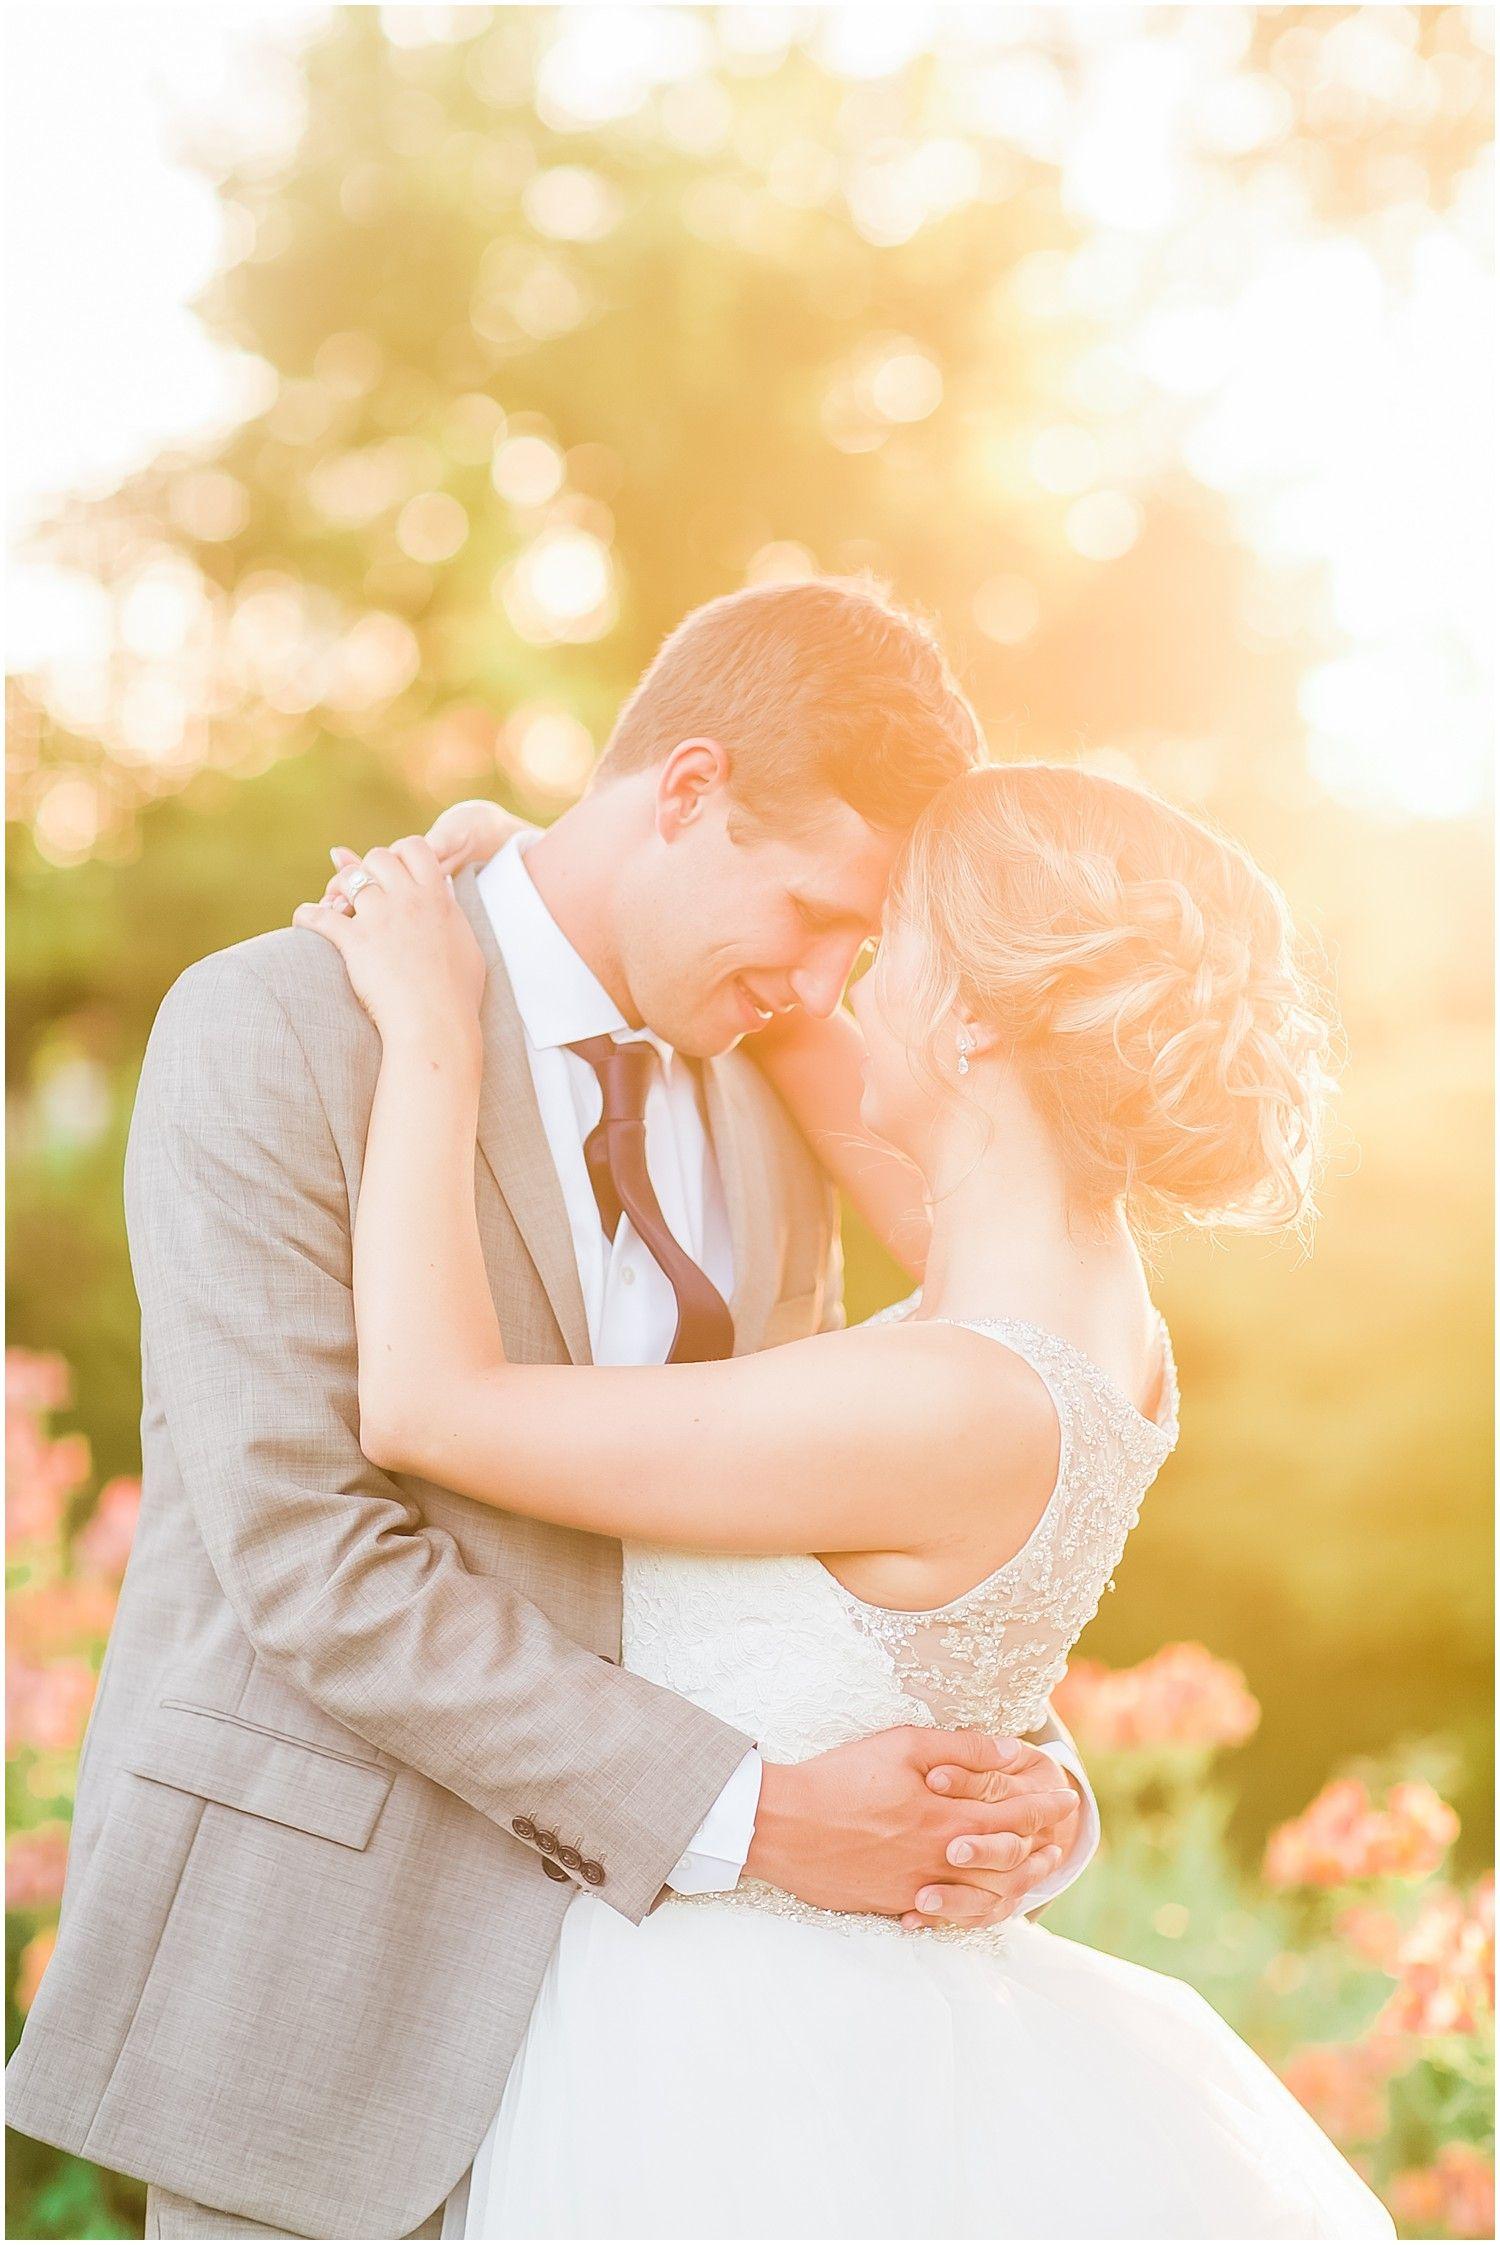 Visalia Rustic Backyard Wedding Sunset Wedding Wedding Dream Wedding